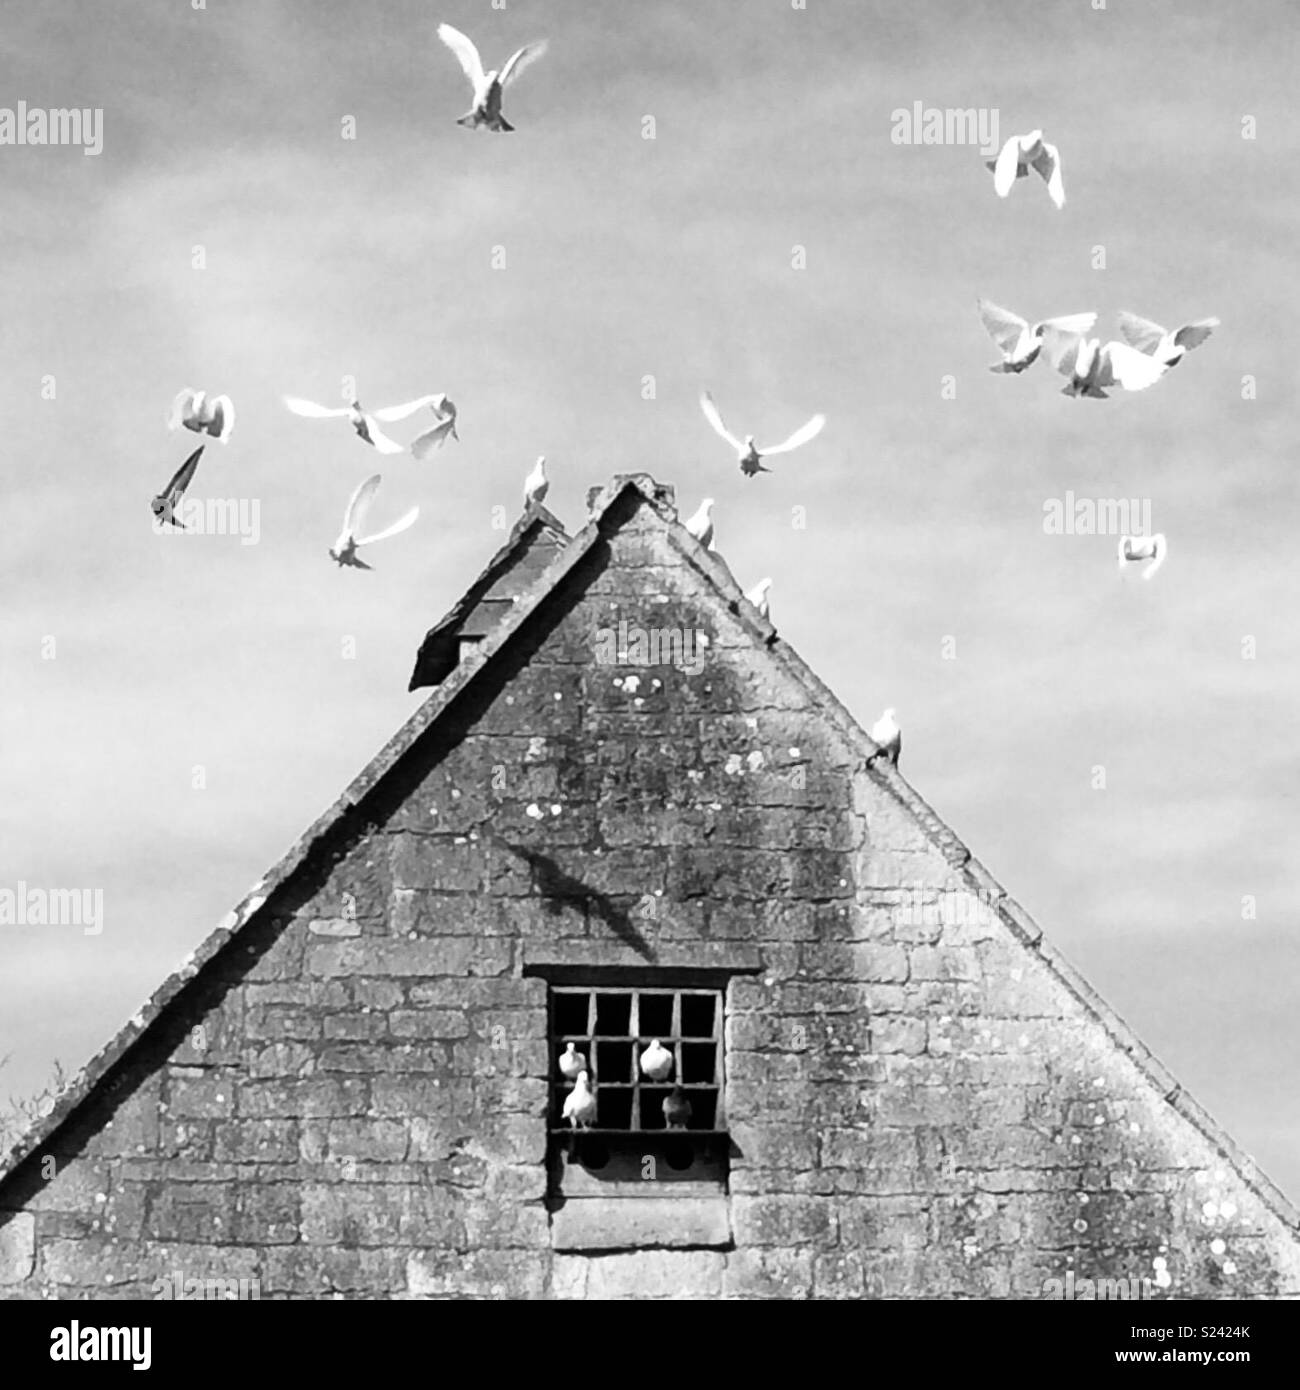 O Pombal, Mansão Snowshill, Gloucestershire. Imagens de Stock